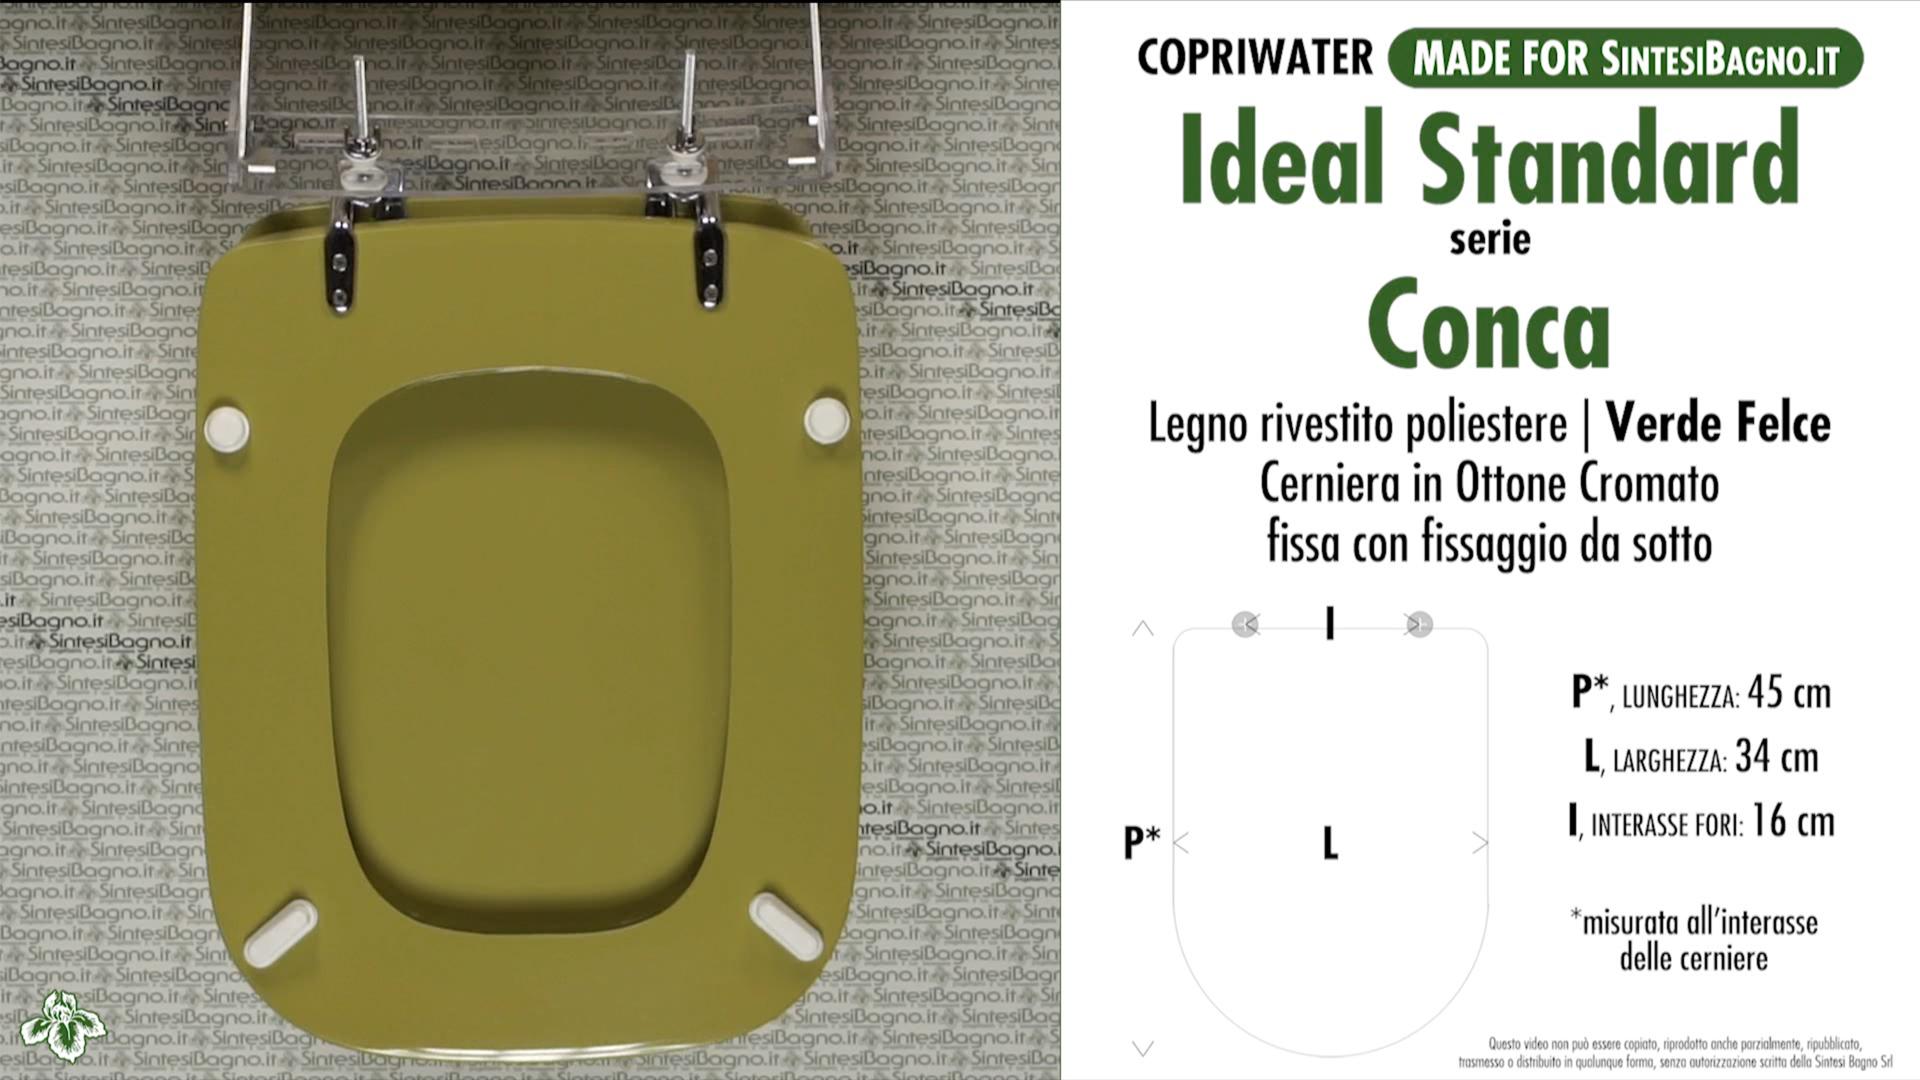 Copriwater Per Vaso Conca Ideal Standard Verde Felce